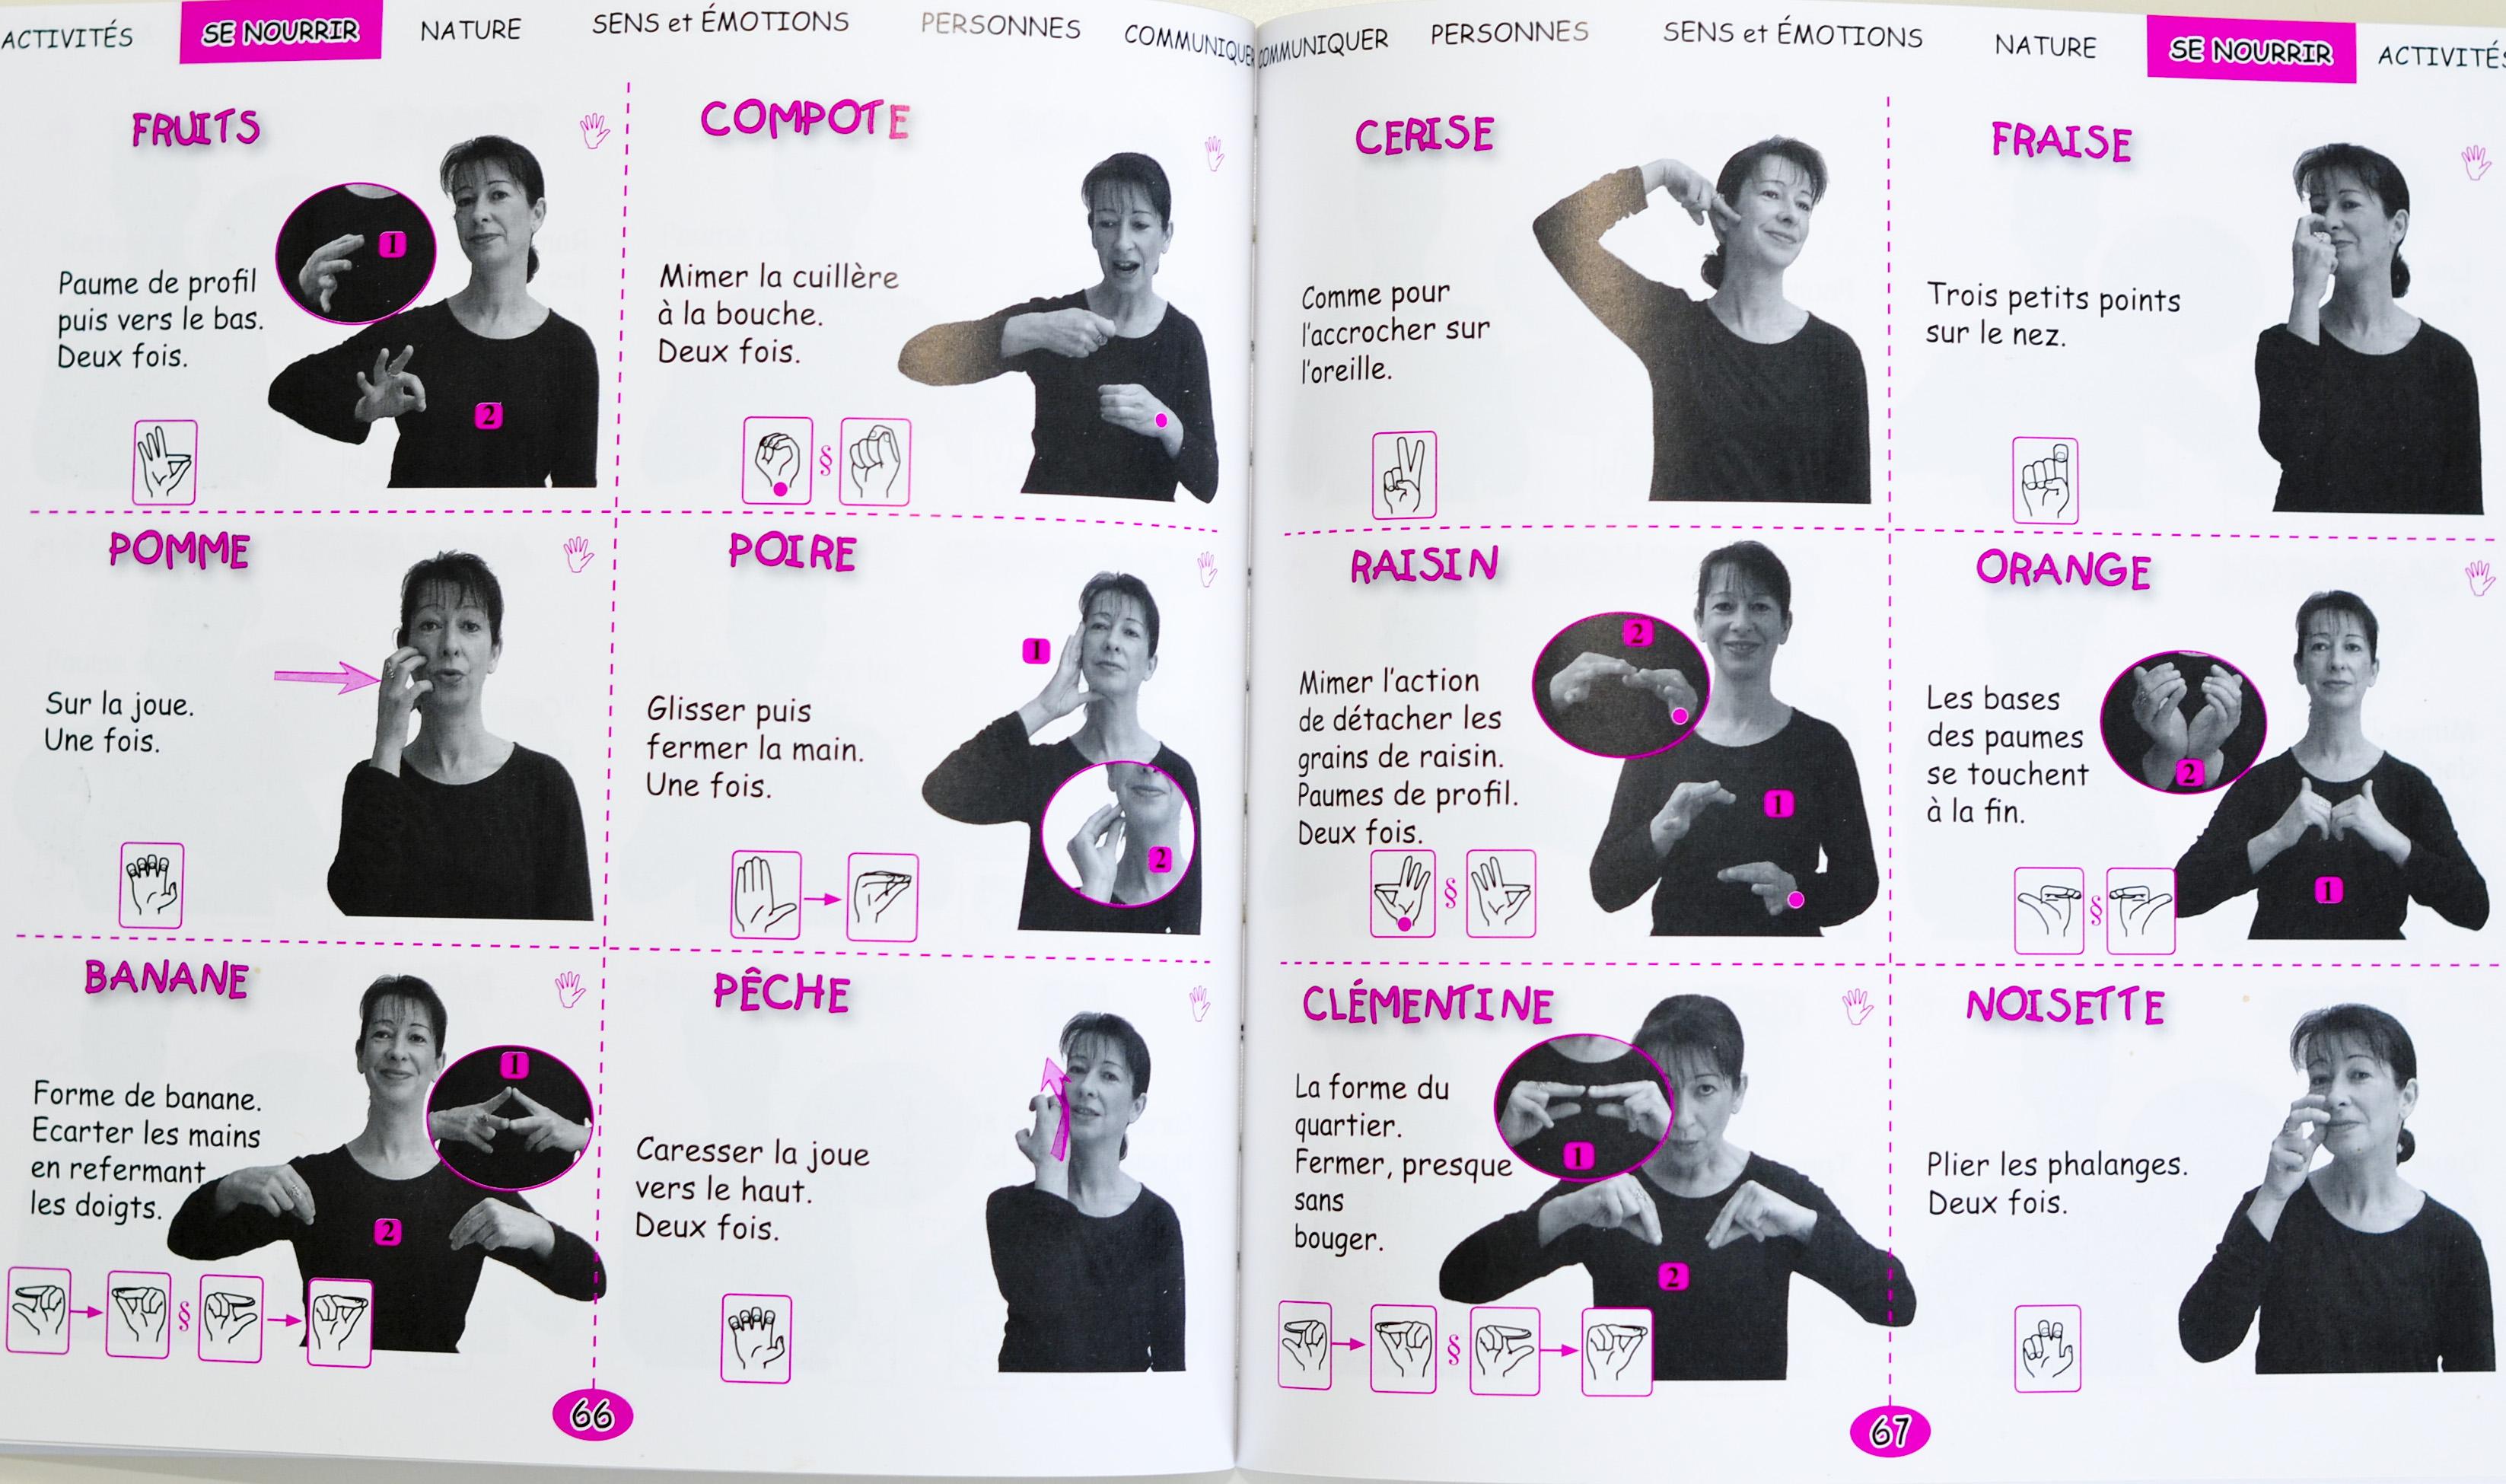 langue des signes b233b233 communiquer avec b233b233